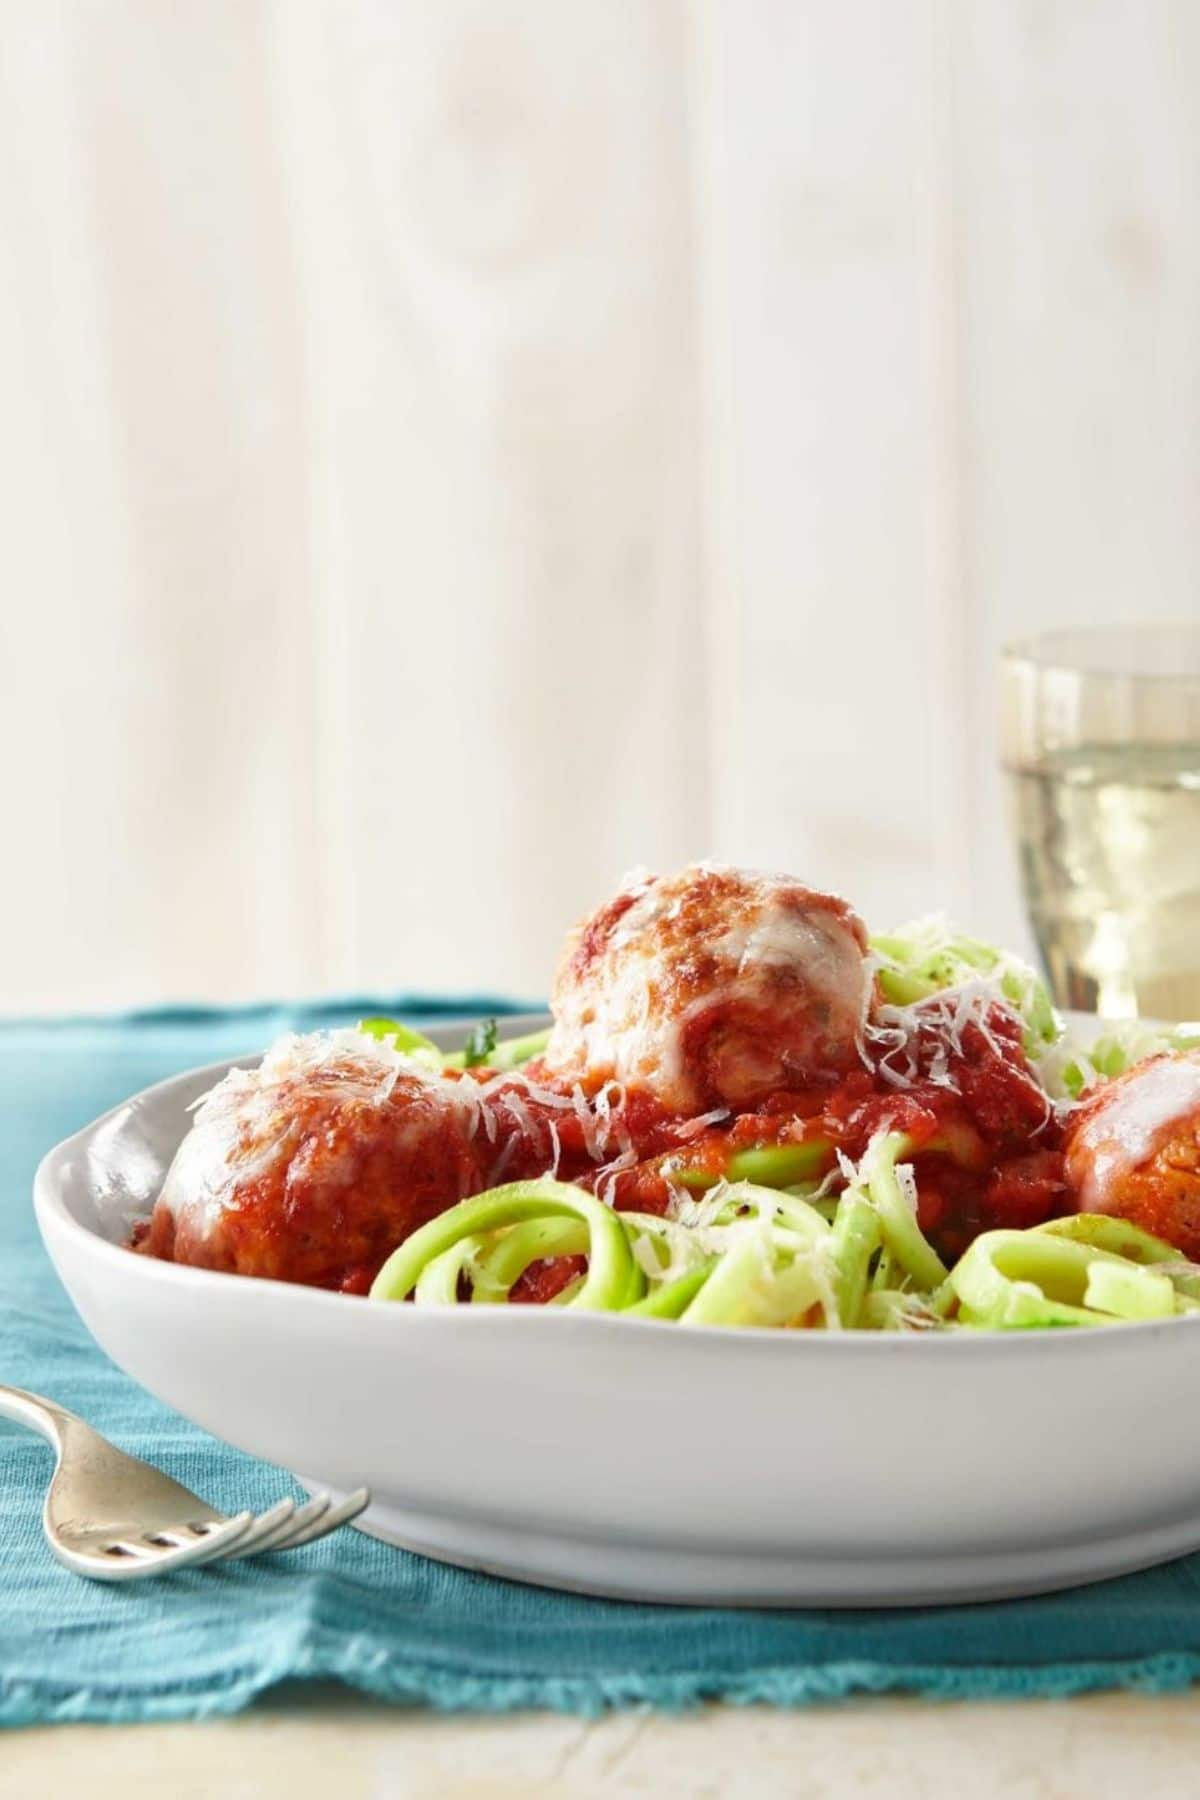 White bowl of zucchini pasta and meatballs on blue cloth napkin